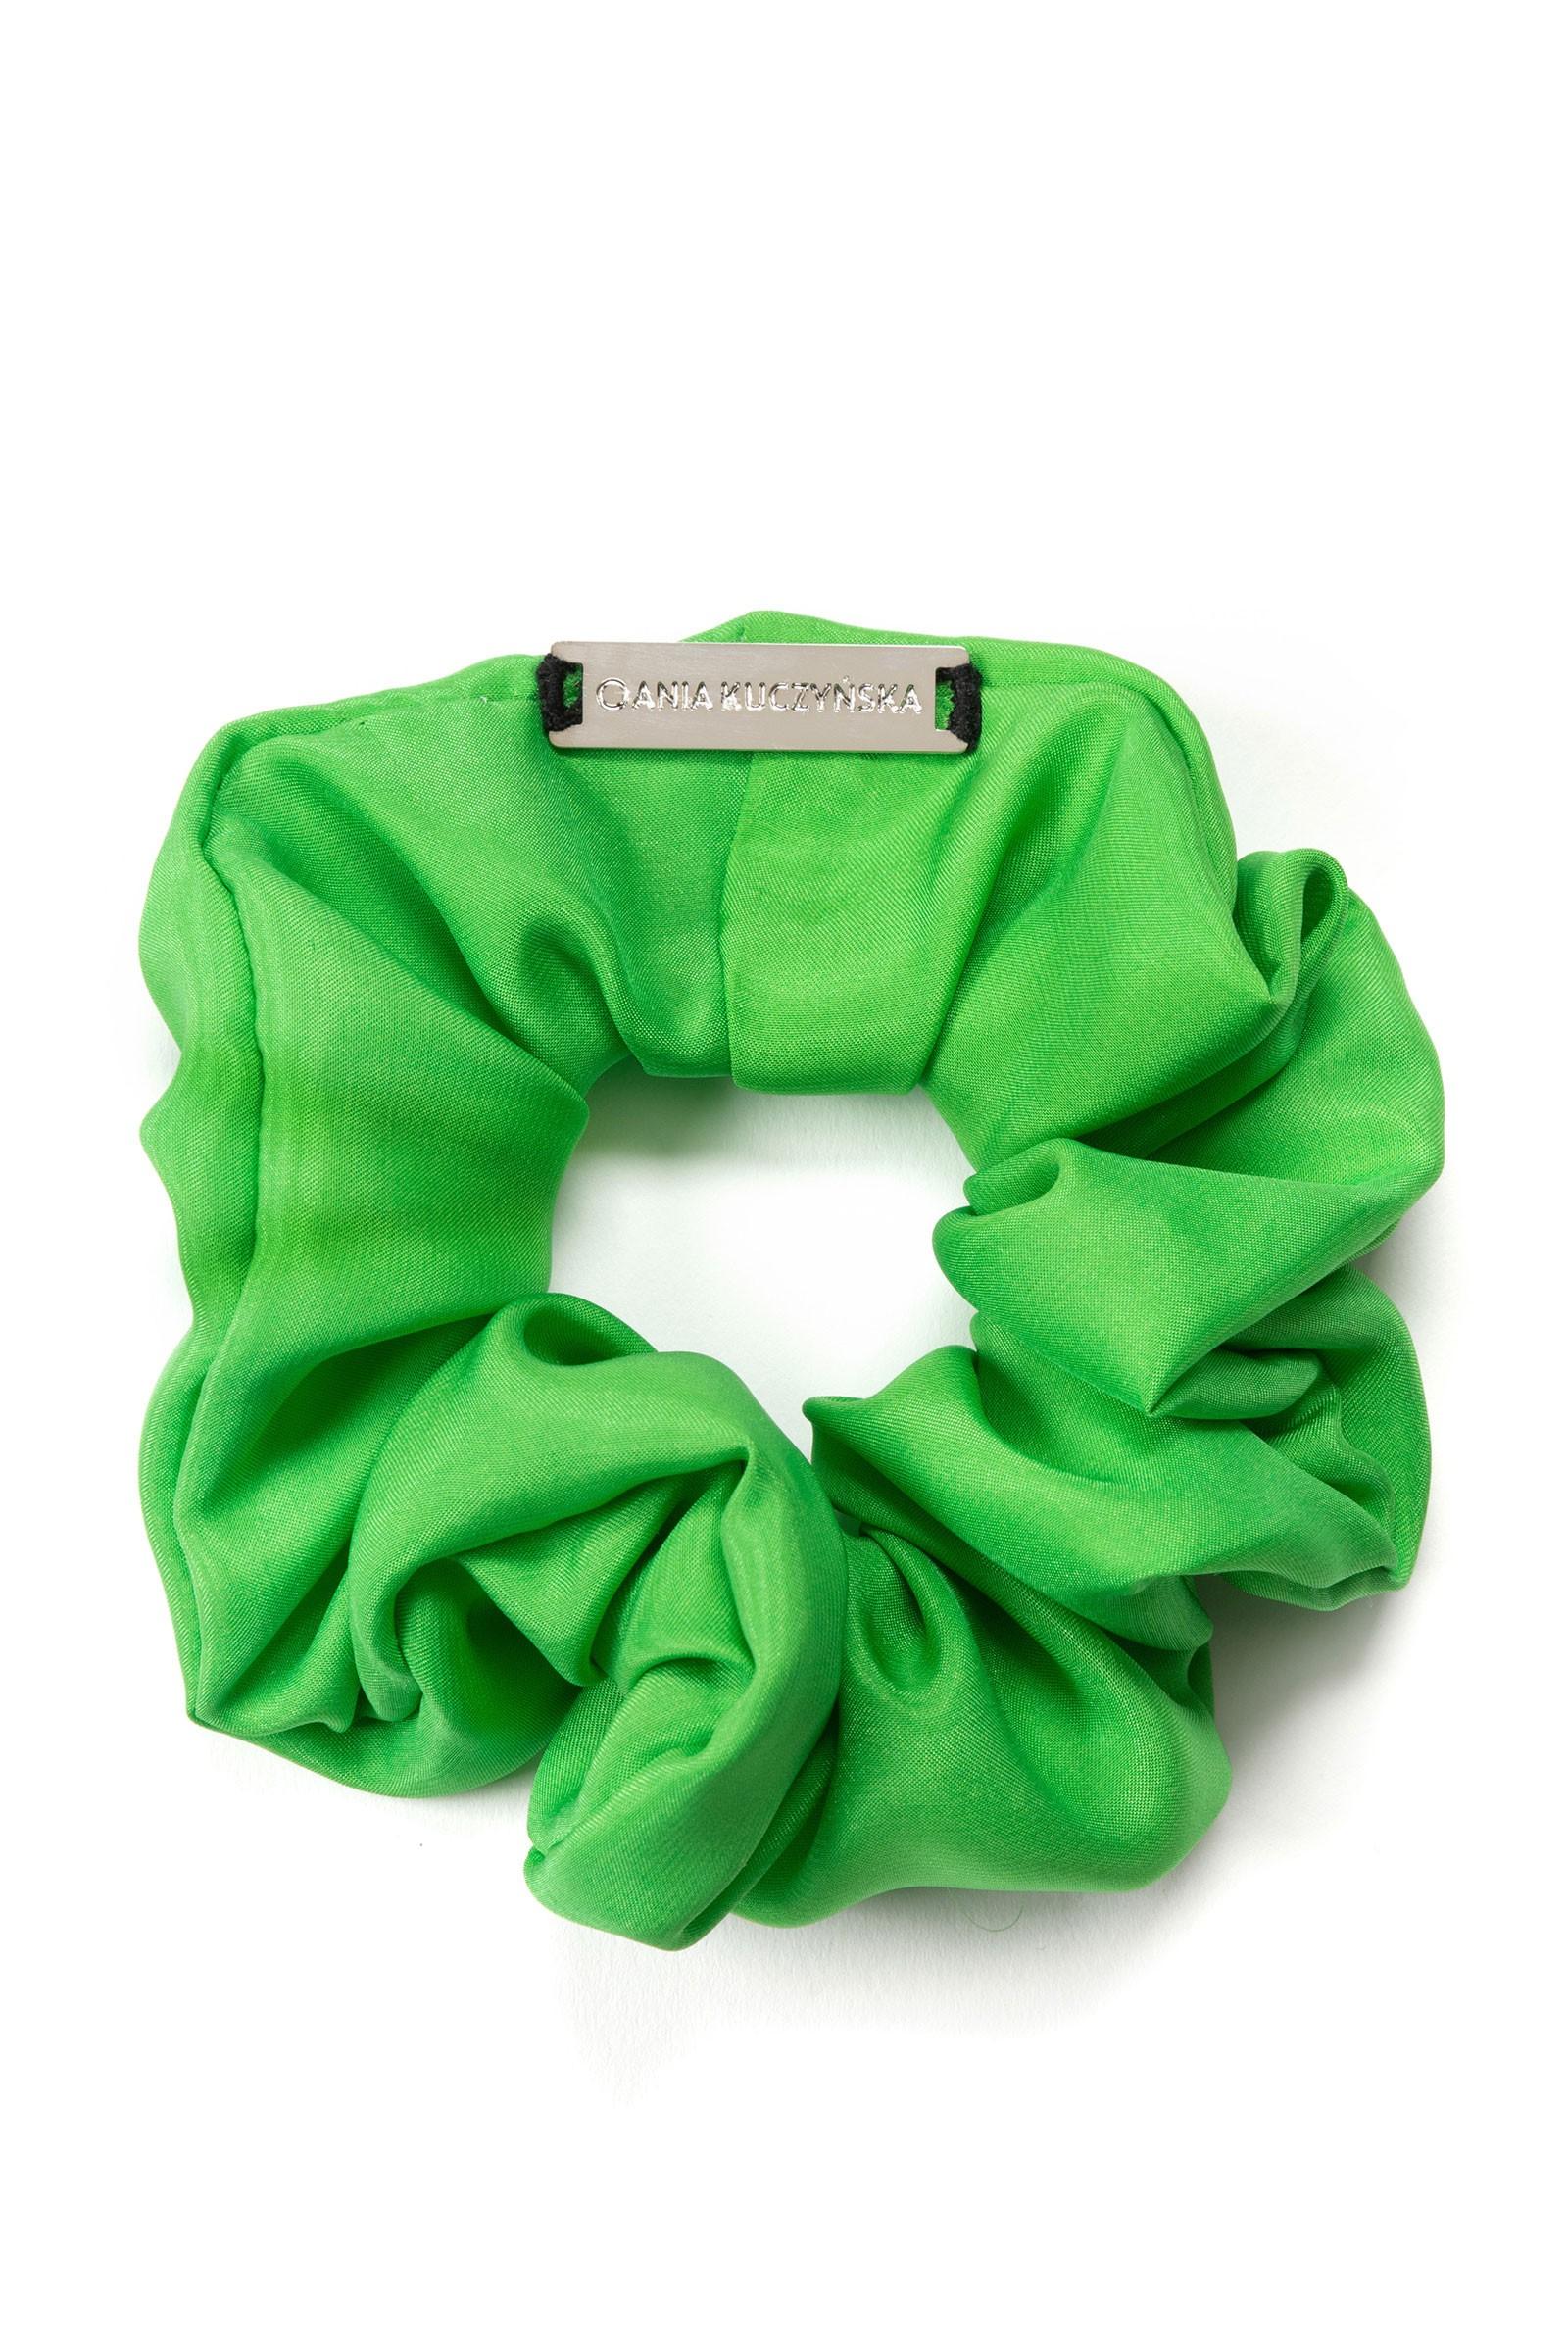 LOU LOU VERDE SILK green